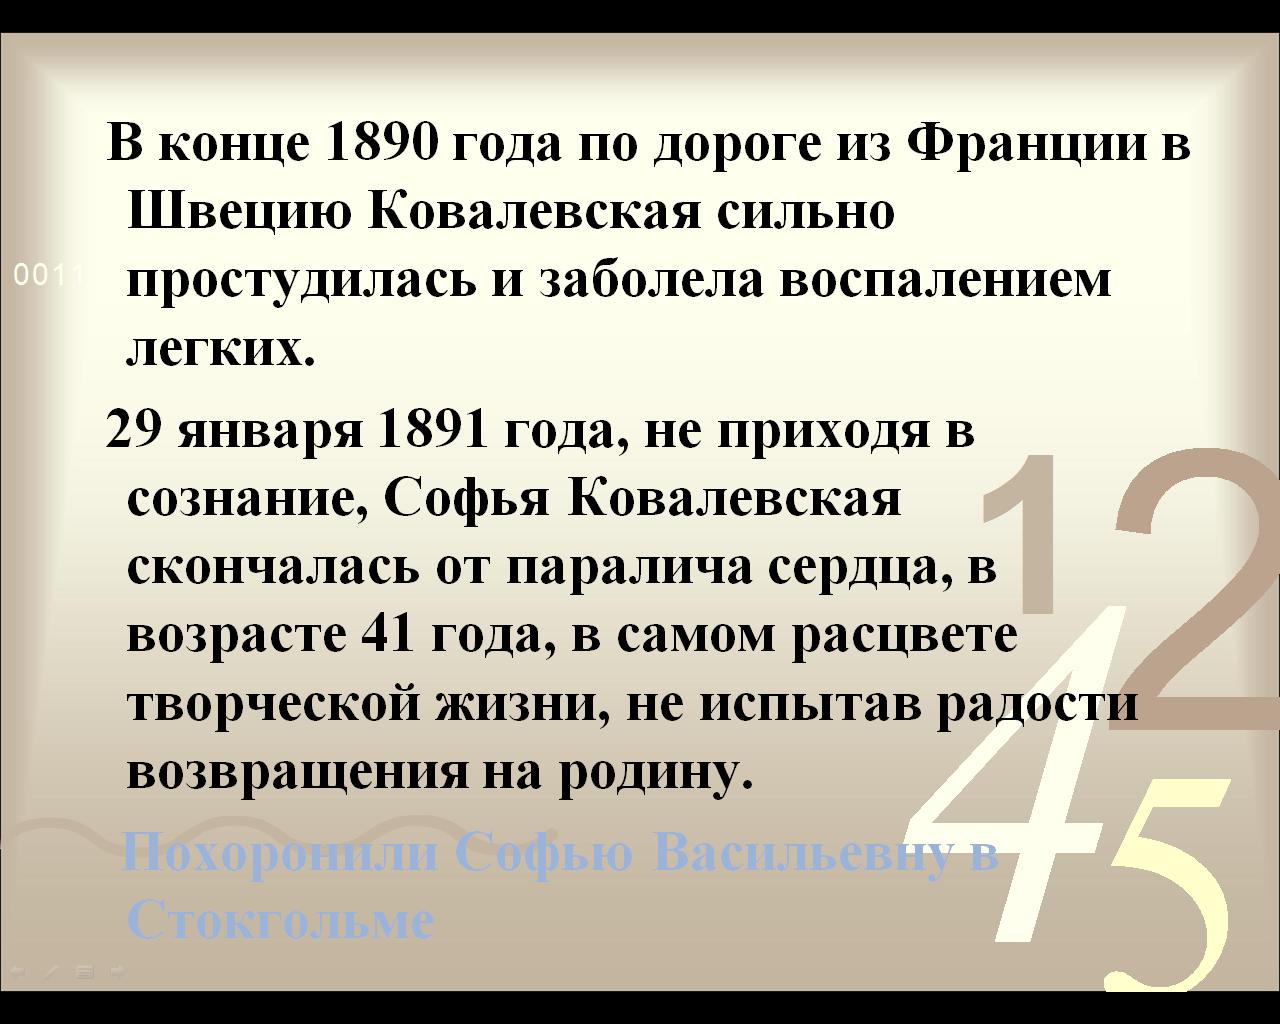 C:\Users\Grigoriy\Desktop\конкурс\слайды\23.png